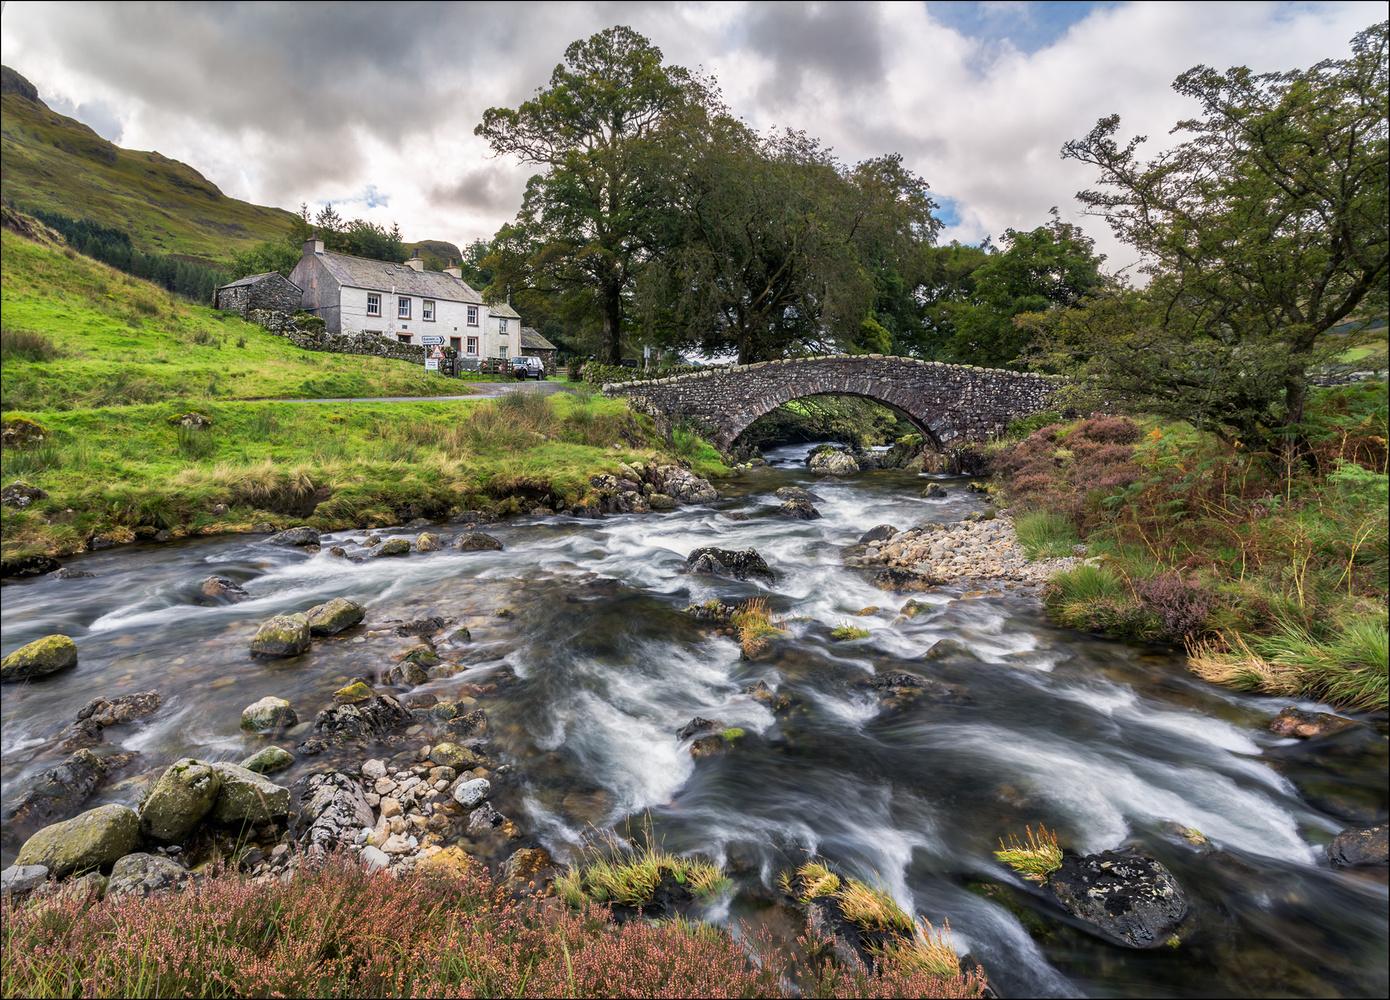 Cockley Beck bridge, Fell Foot Farm, Langdale  by Mark Heavisides